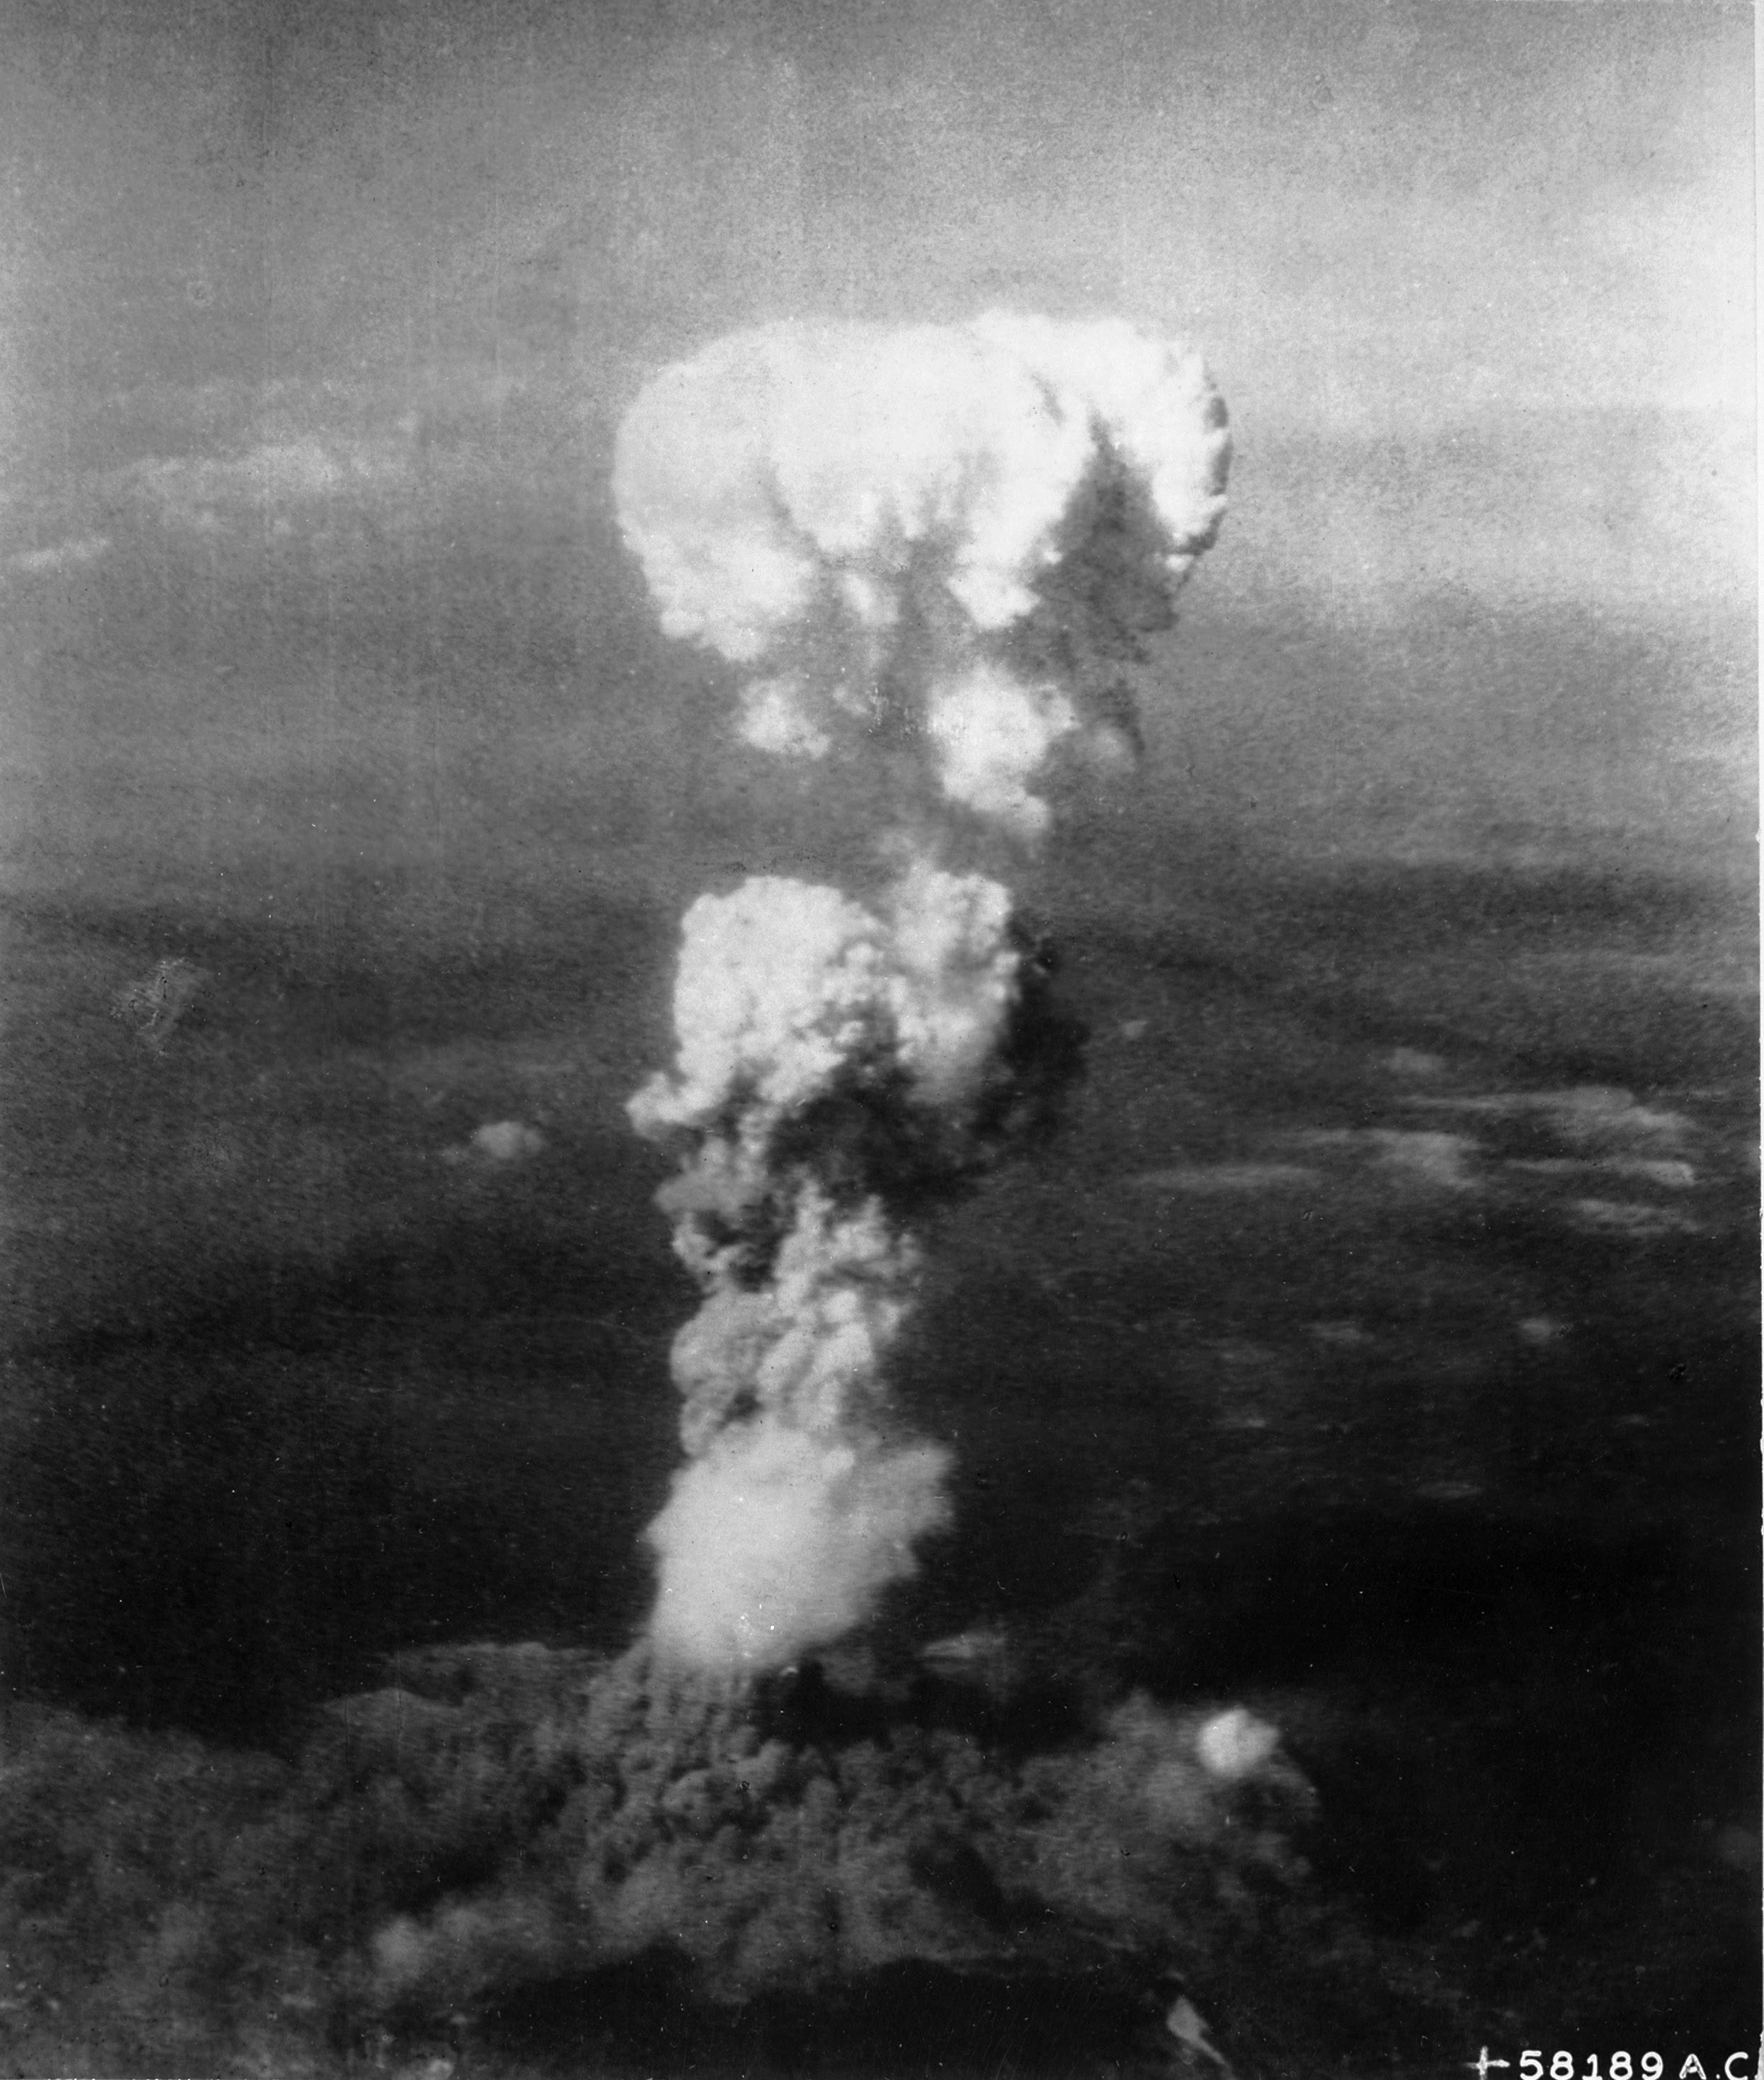 Remember Hiroshima!